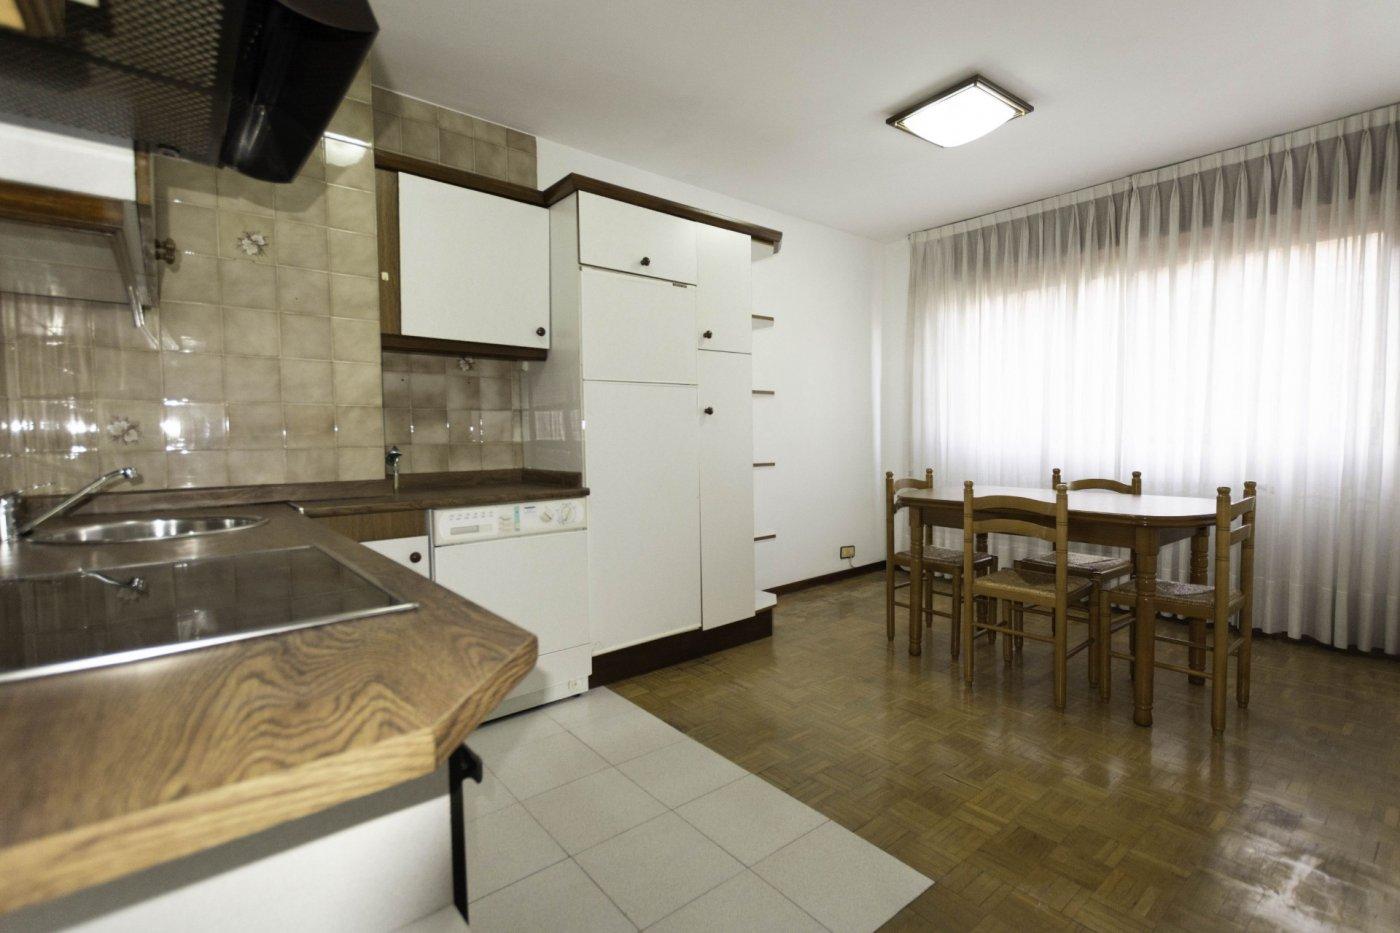 Apartamento en vallobin - imagenInmueble2